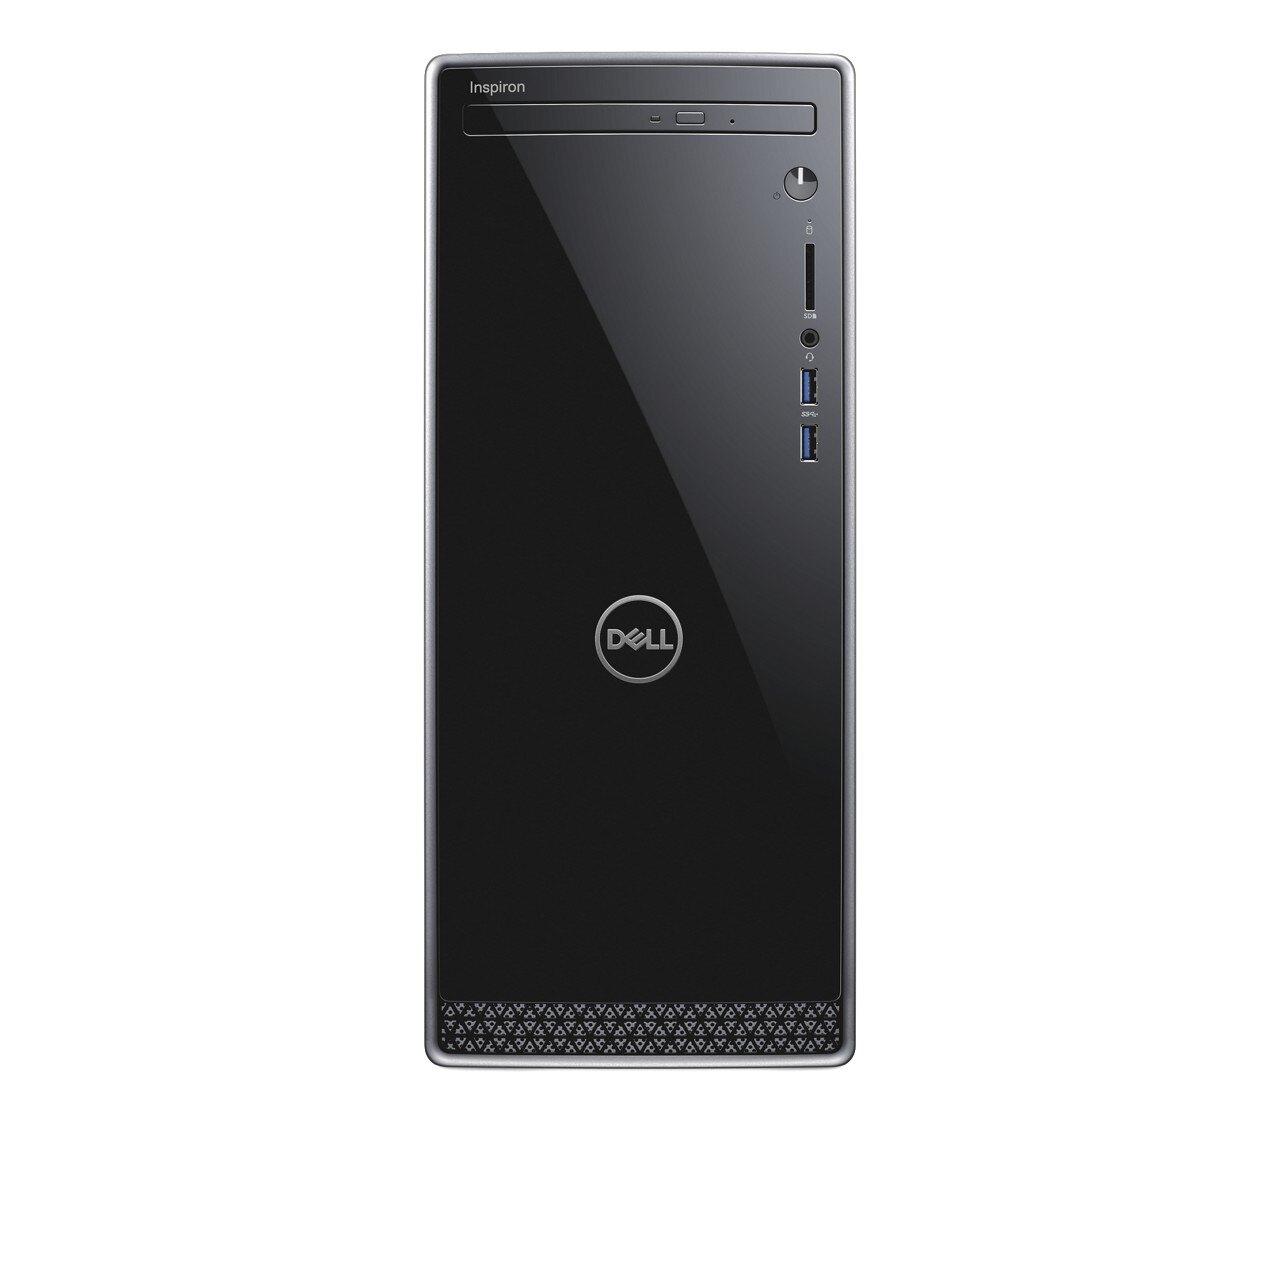 Dell Inspiron 3670 Desktop Intel i5-9400 128GB SSD + 1TB HDD 12GB RAM : $579.99 + $144.75 back in points + FS